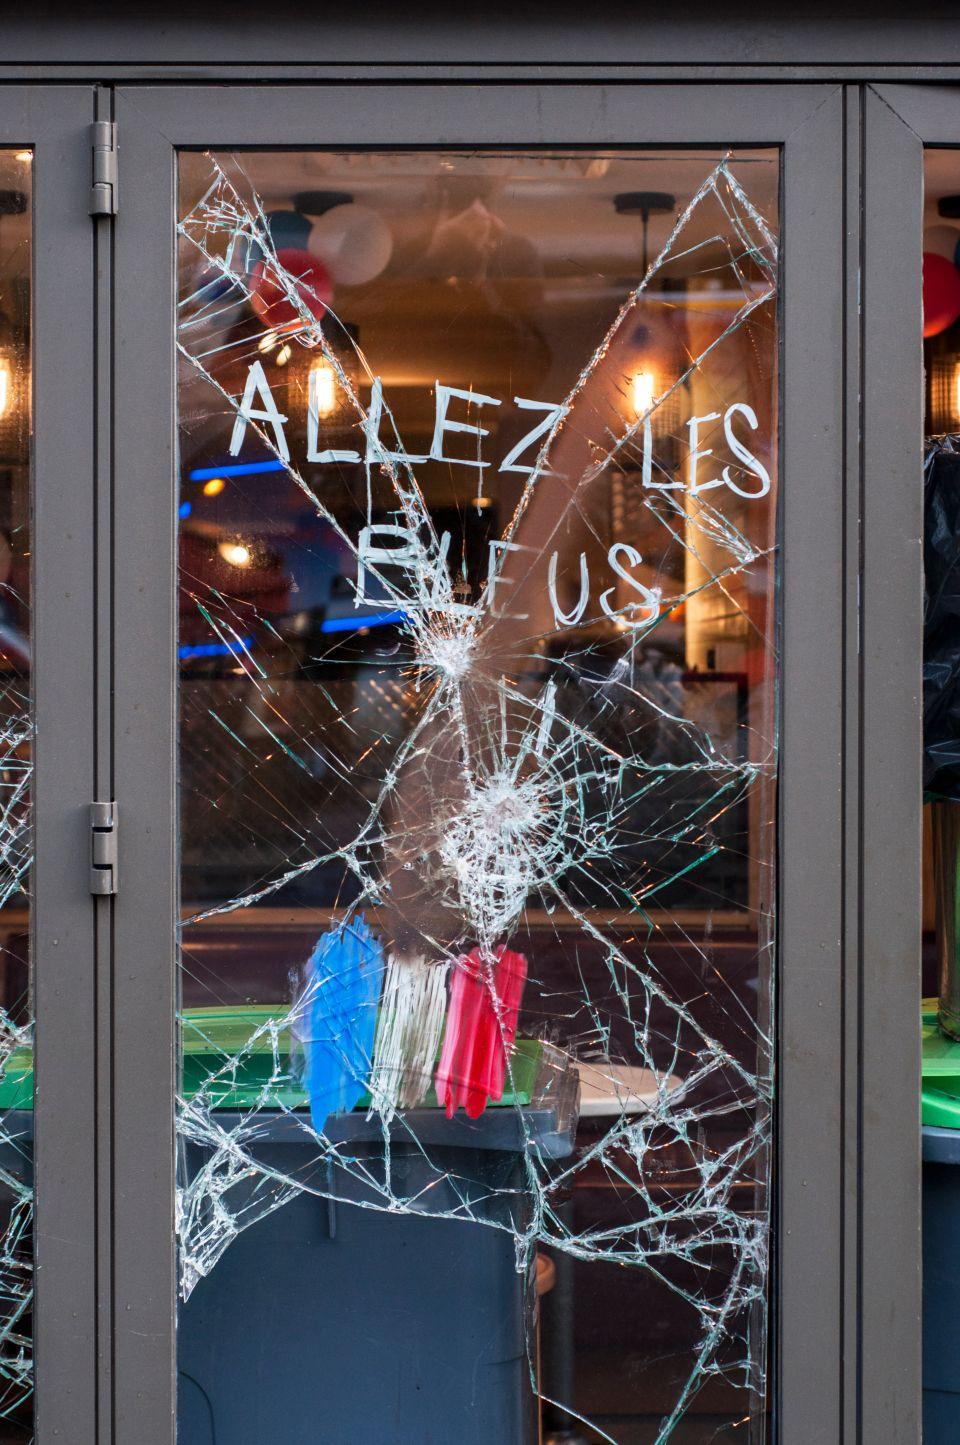 Paris deadlocked